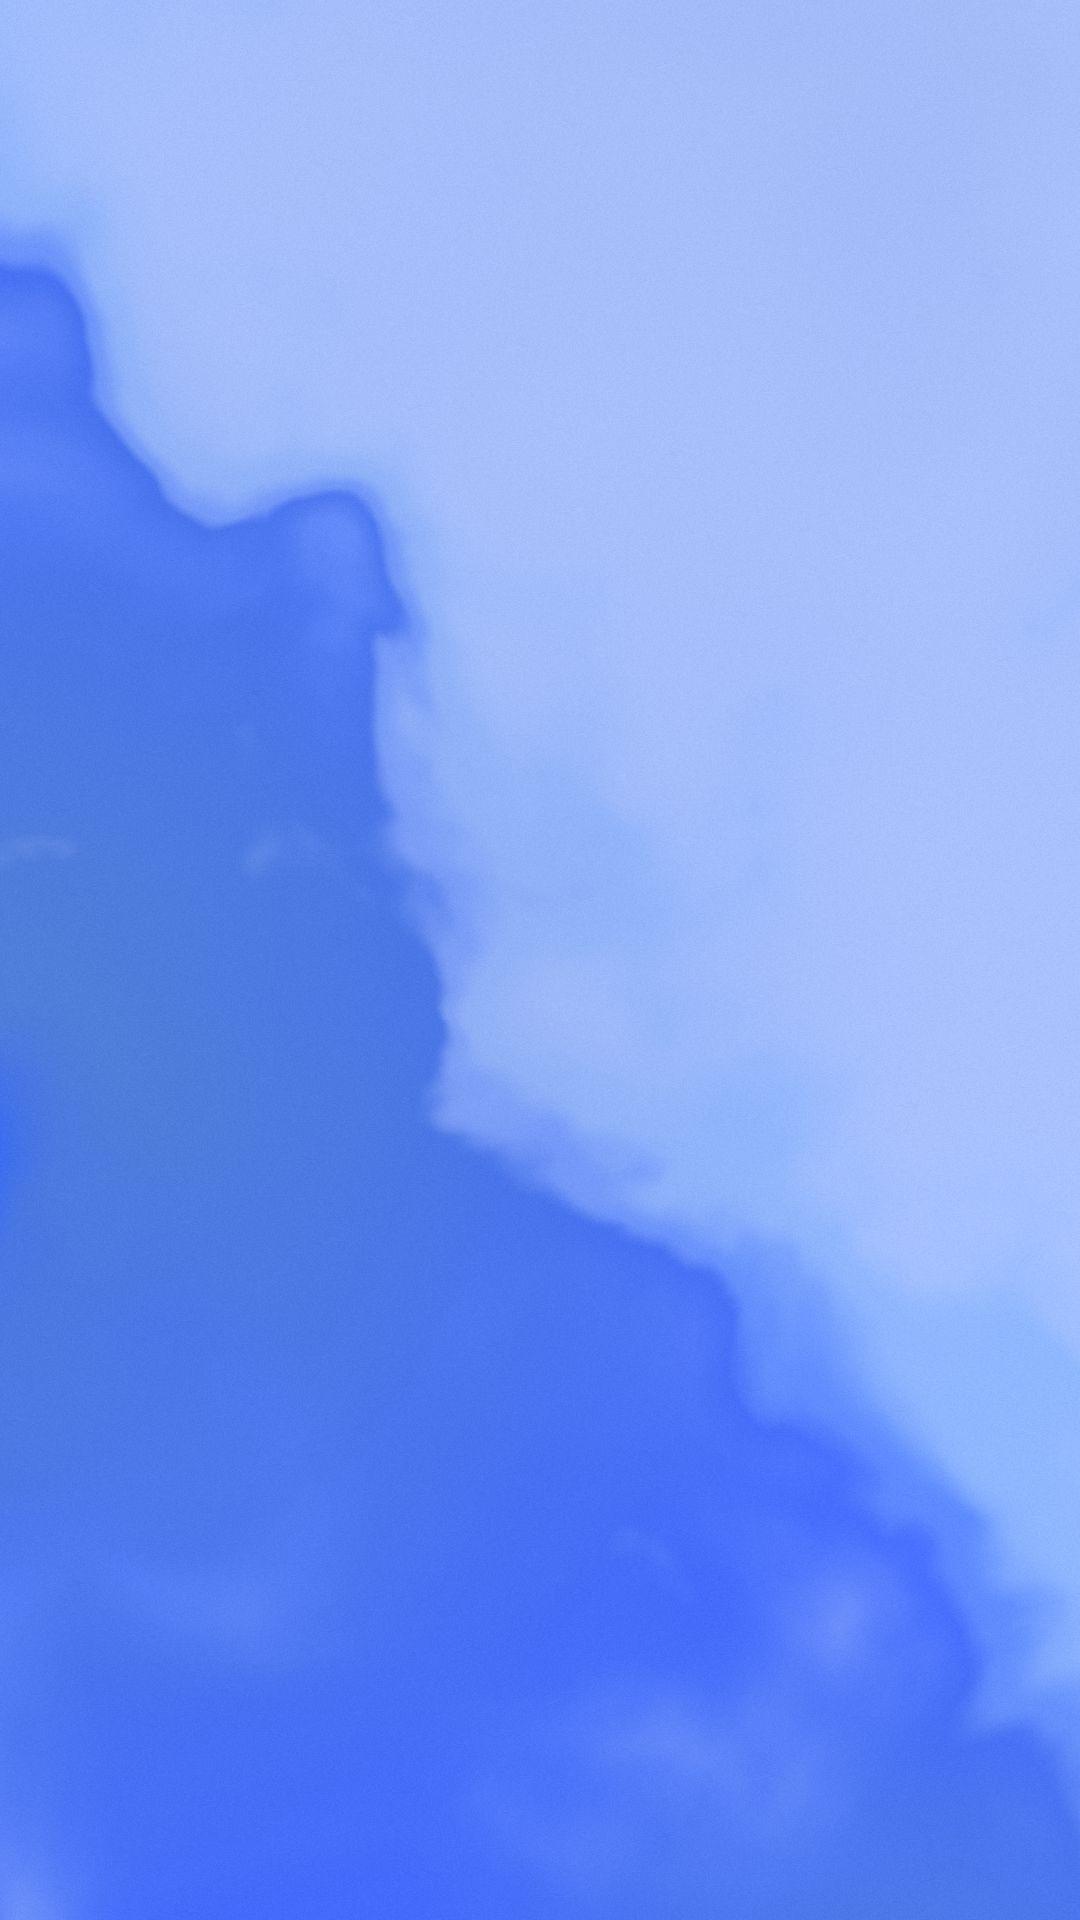 Google Pixel 3 Stock Wallpaper 019 - [1080x1920]